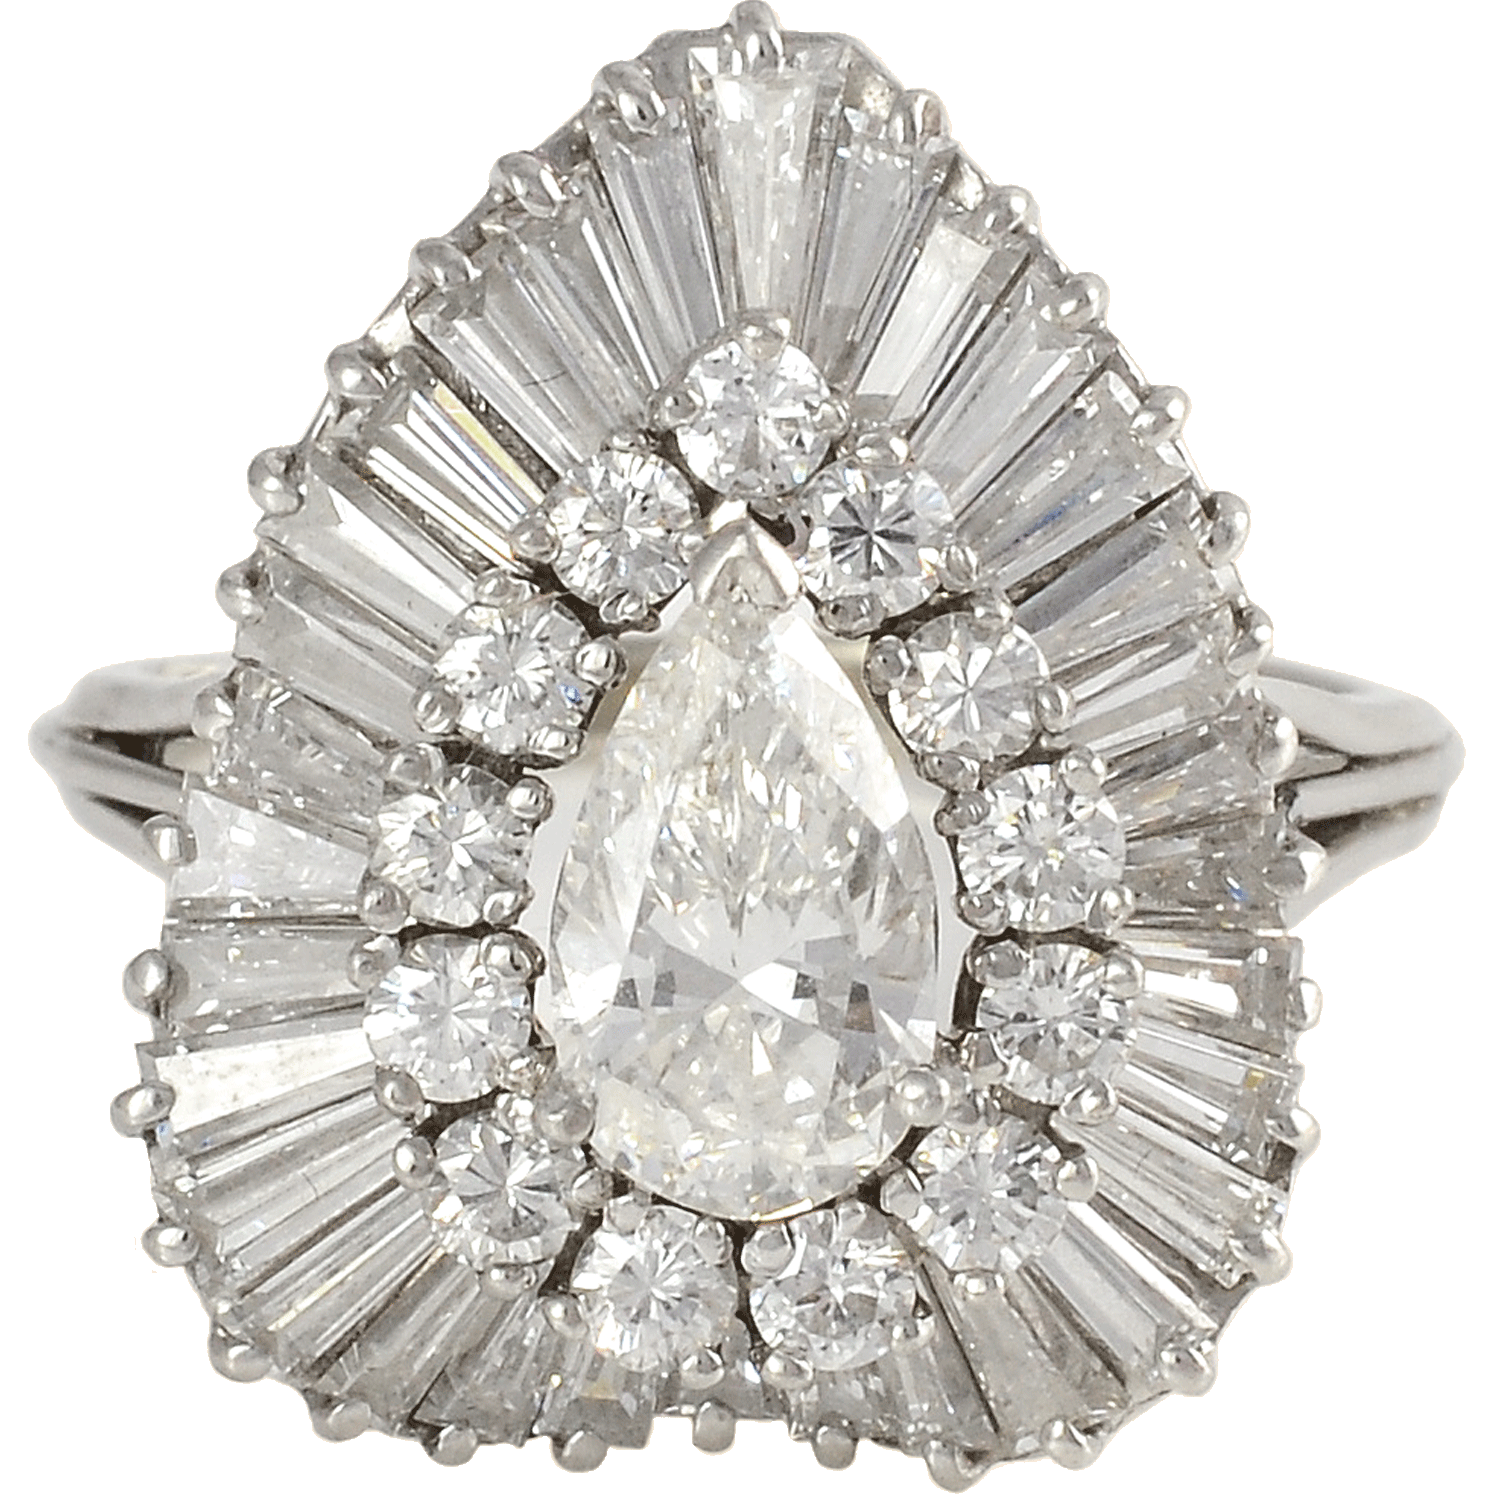 Platinum 4.96 CTW Diamond Ring with Pear Center